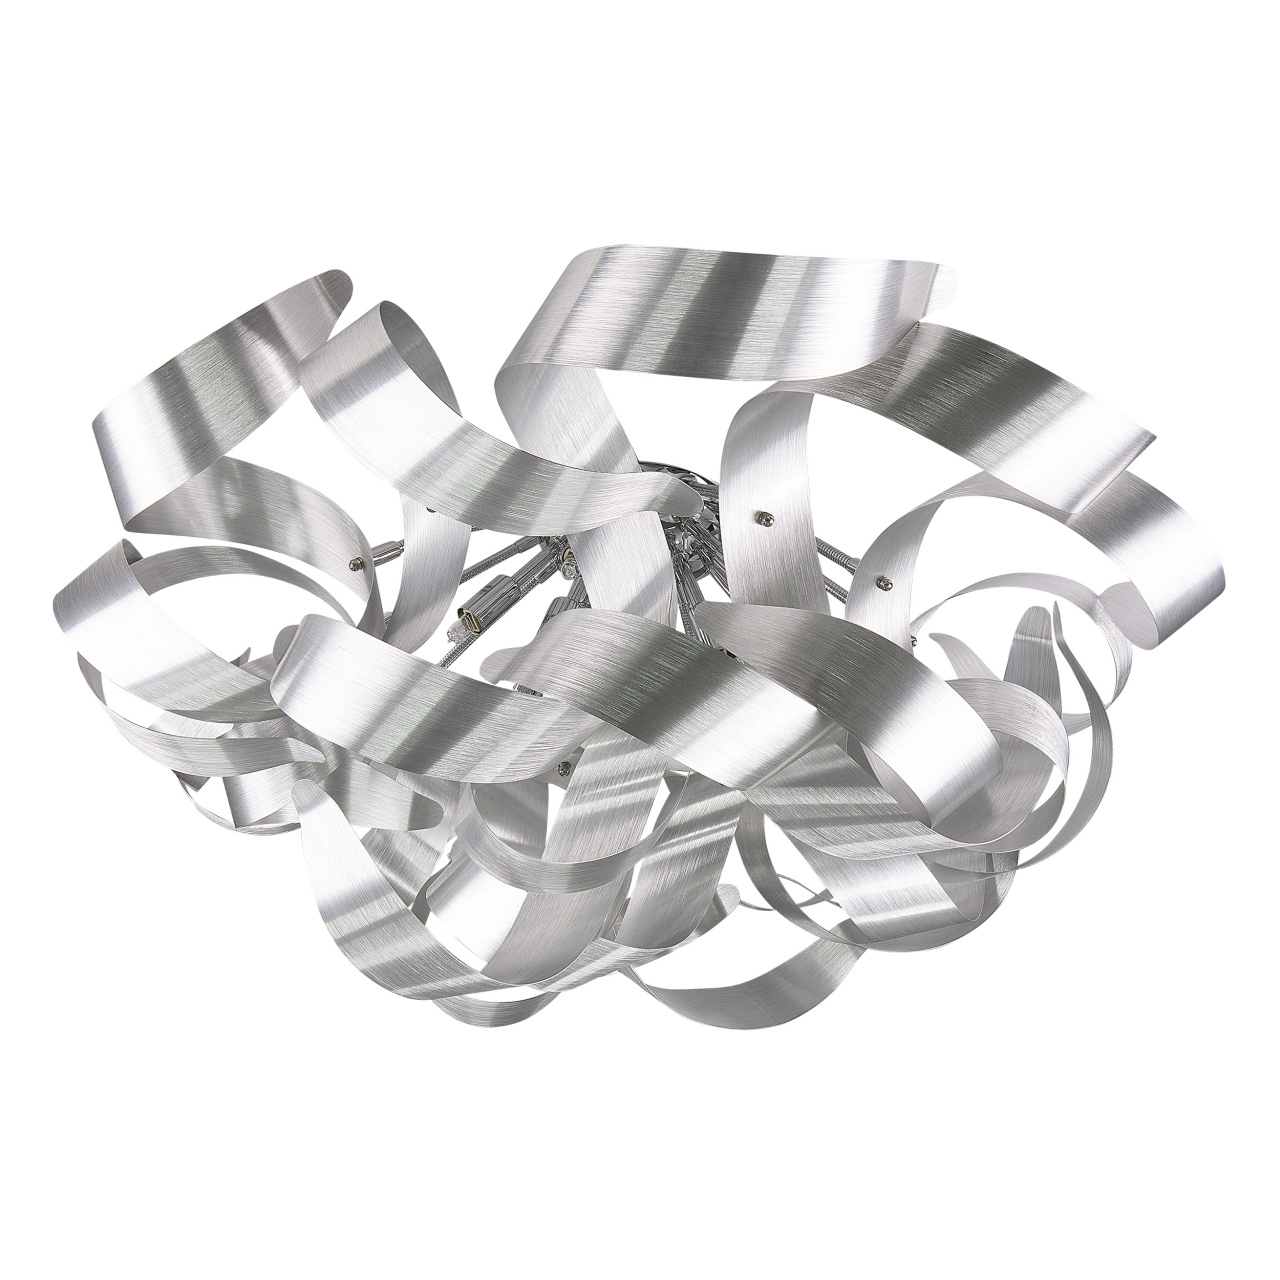 Светильник потолочный Turbio 9х40W G9 satin alu Lightstar 754099